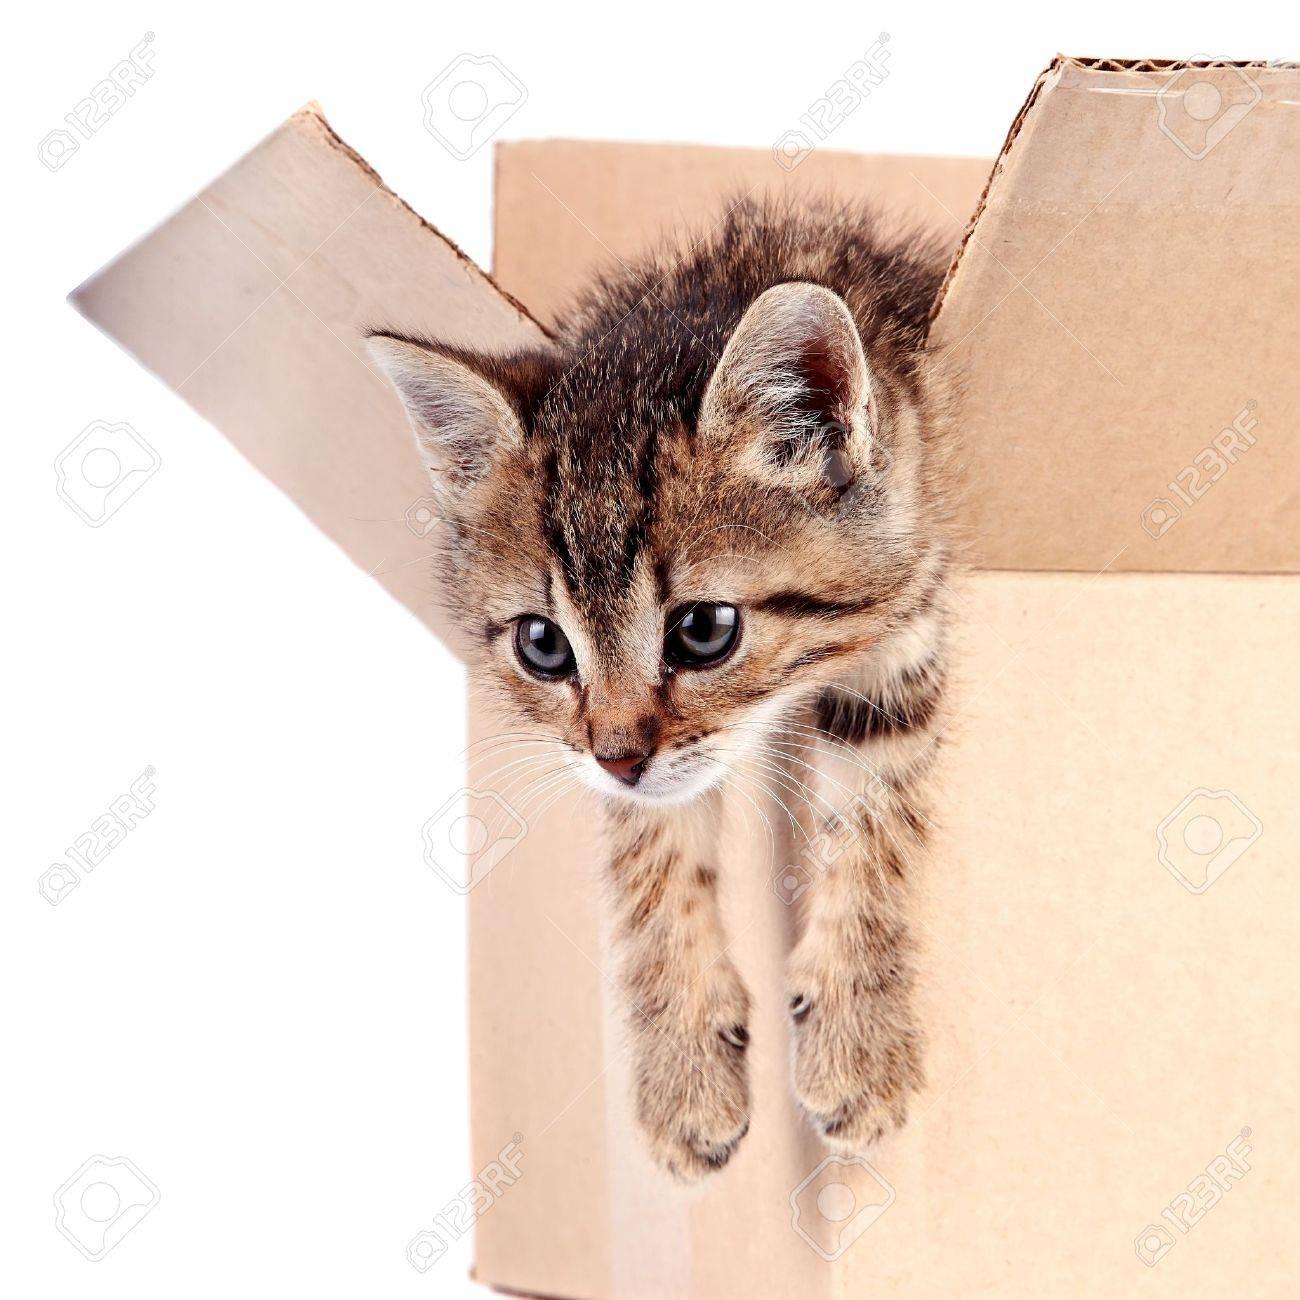 Kitten in a box on a white background Standard-Bild - 16693767